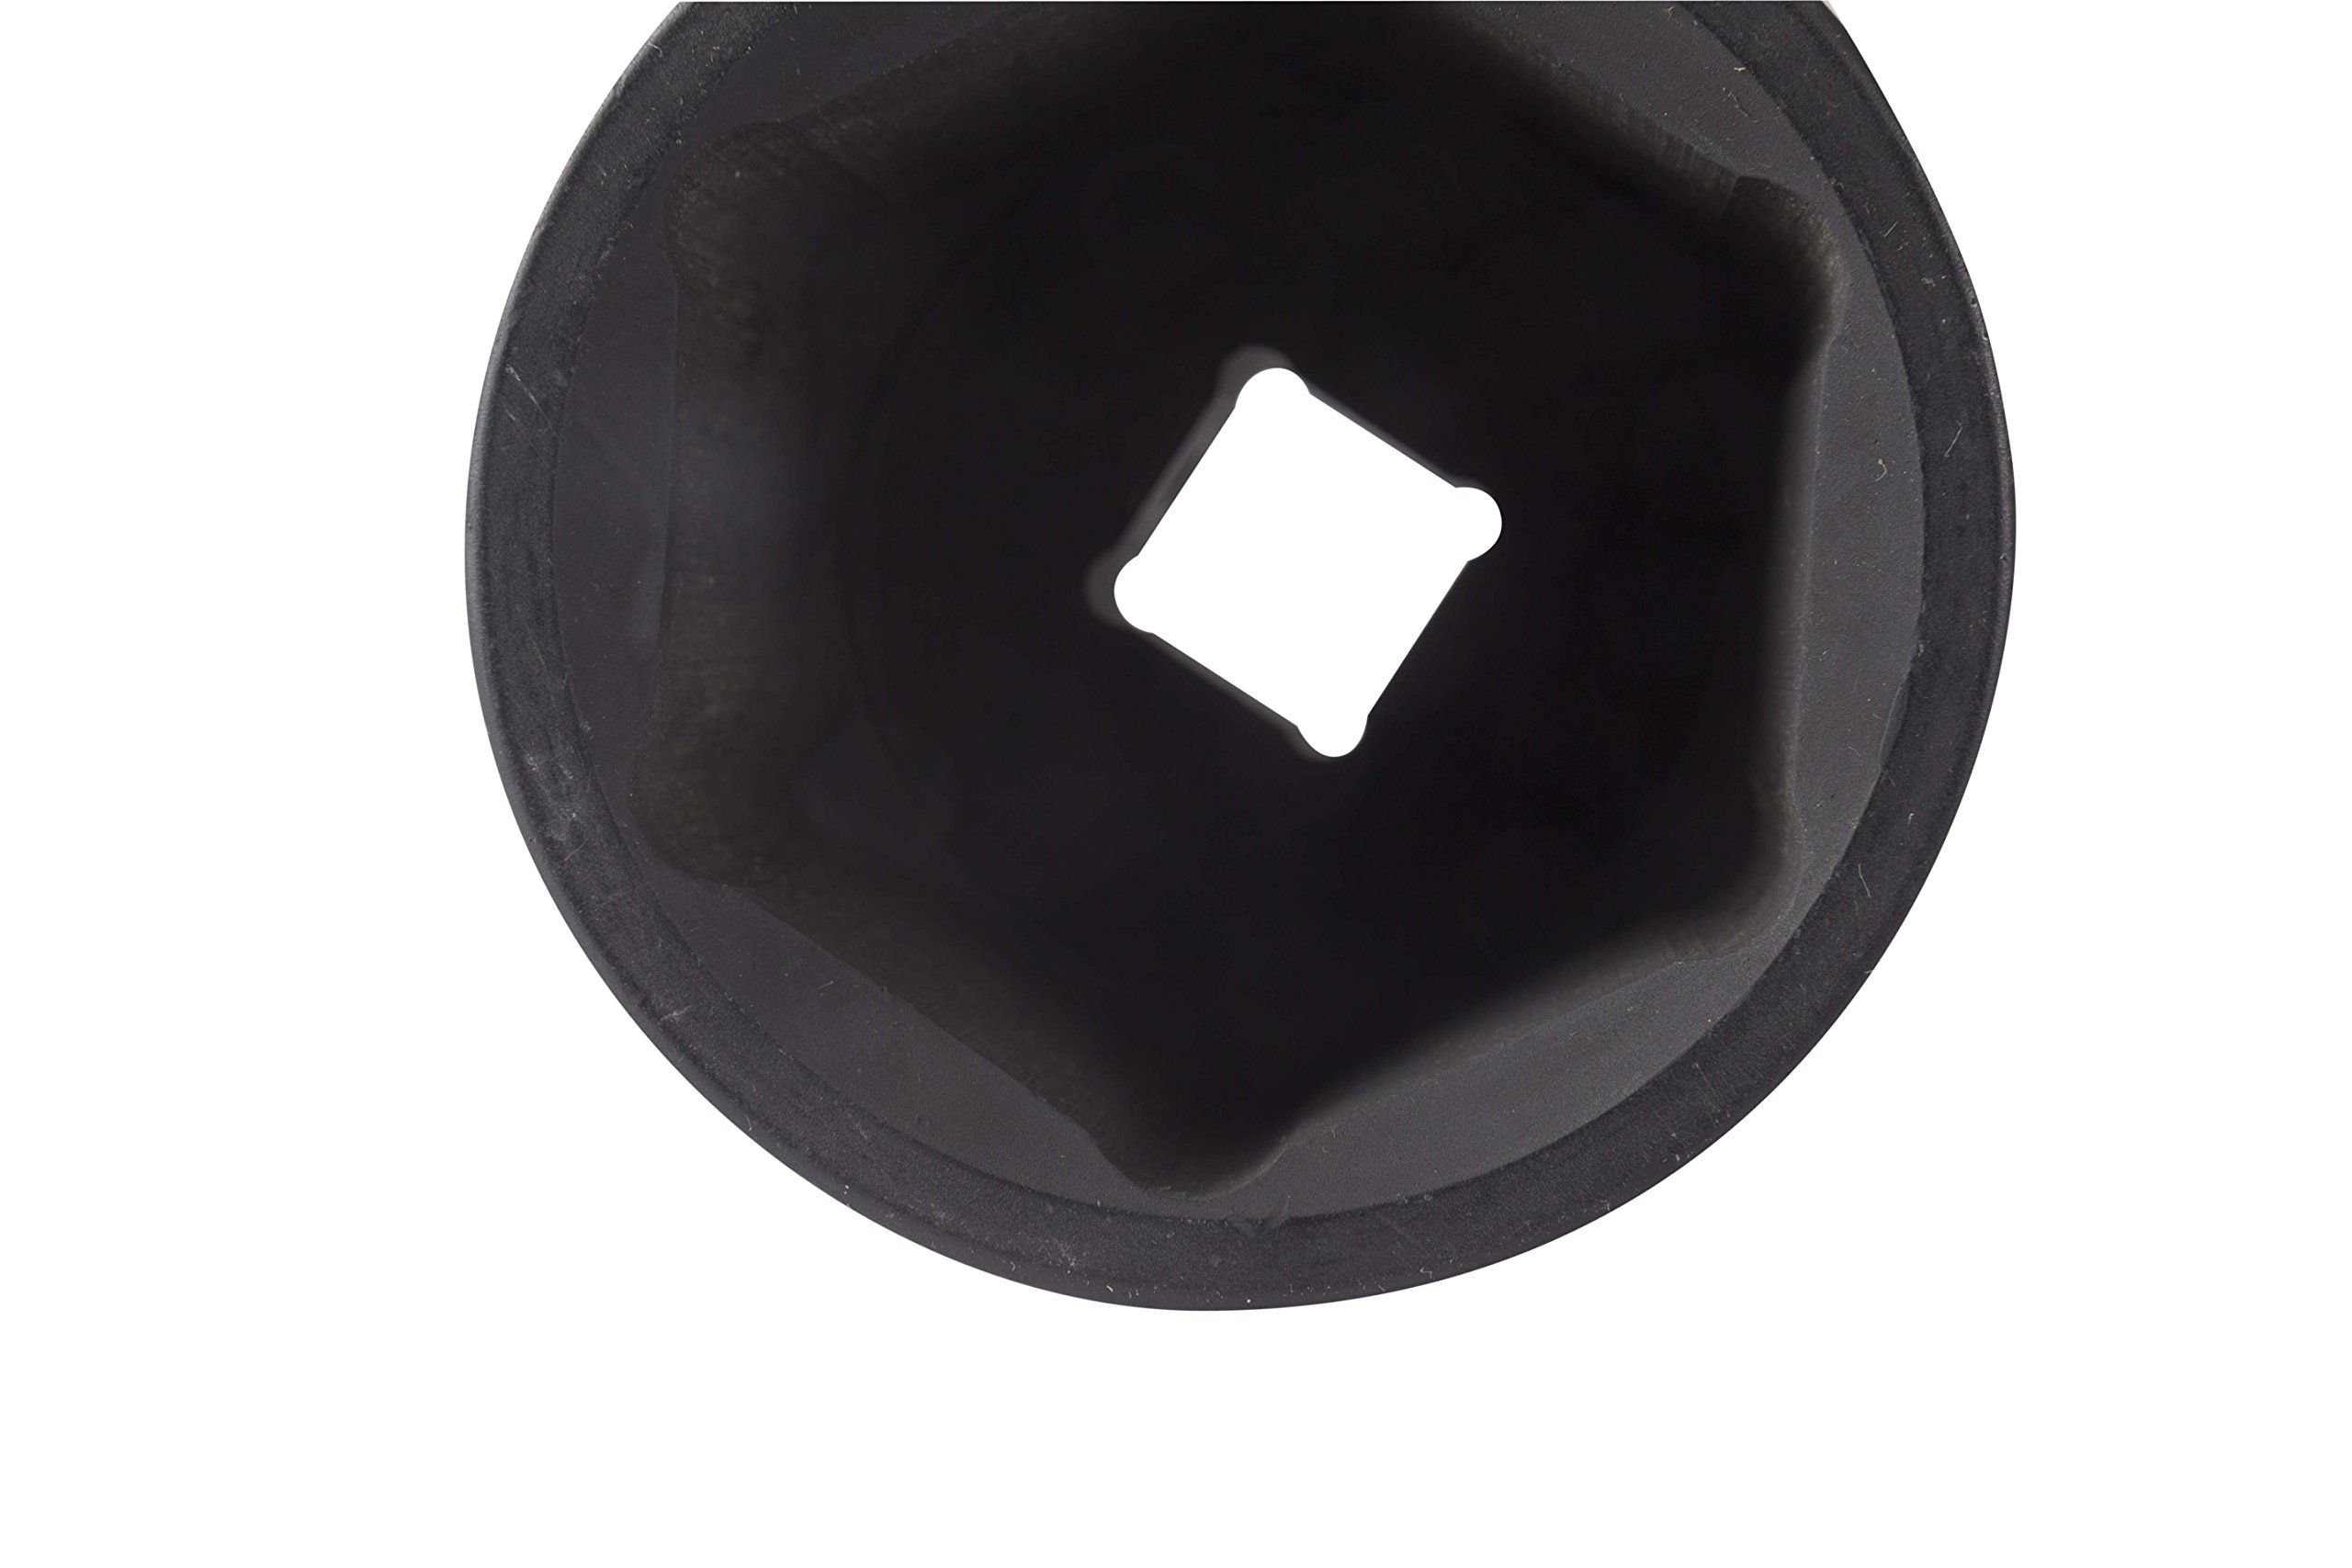 Sunex 230zmd 1//2-Inch Drive 30-mm 12-Point Deep Impact Socket